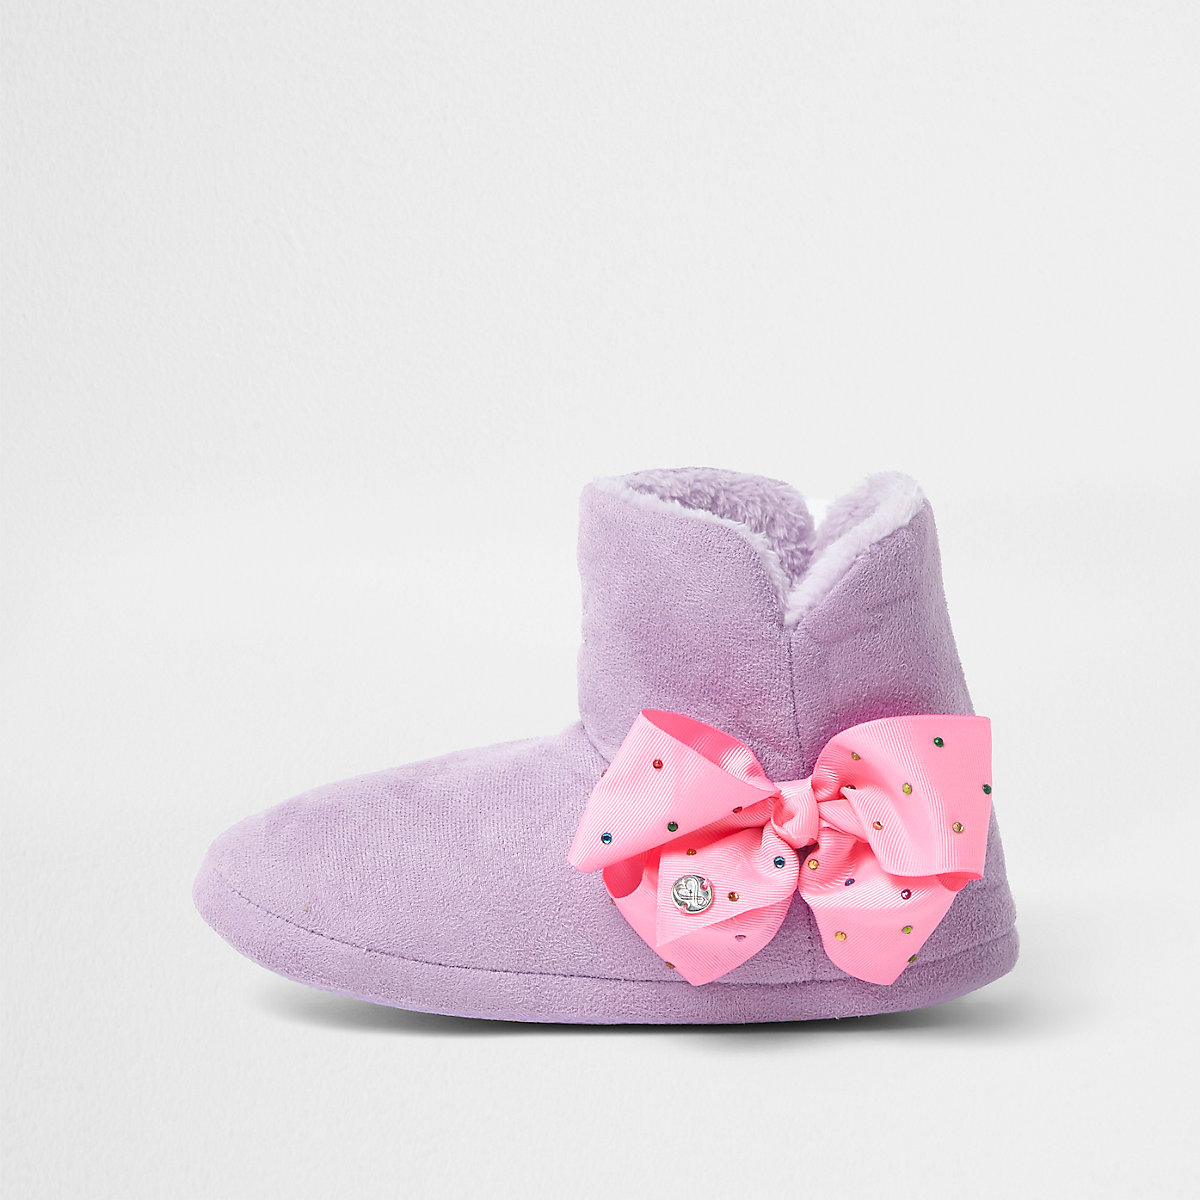 Girls purple JoJo Bows boot slippers